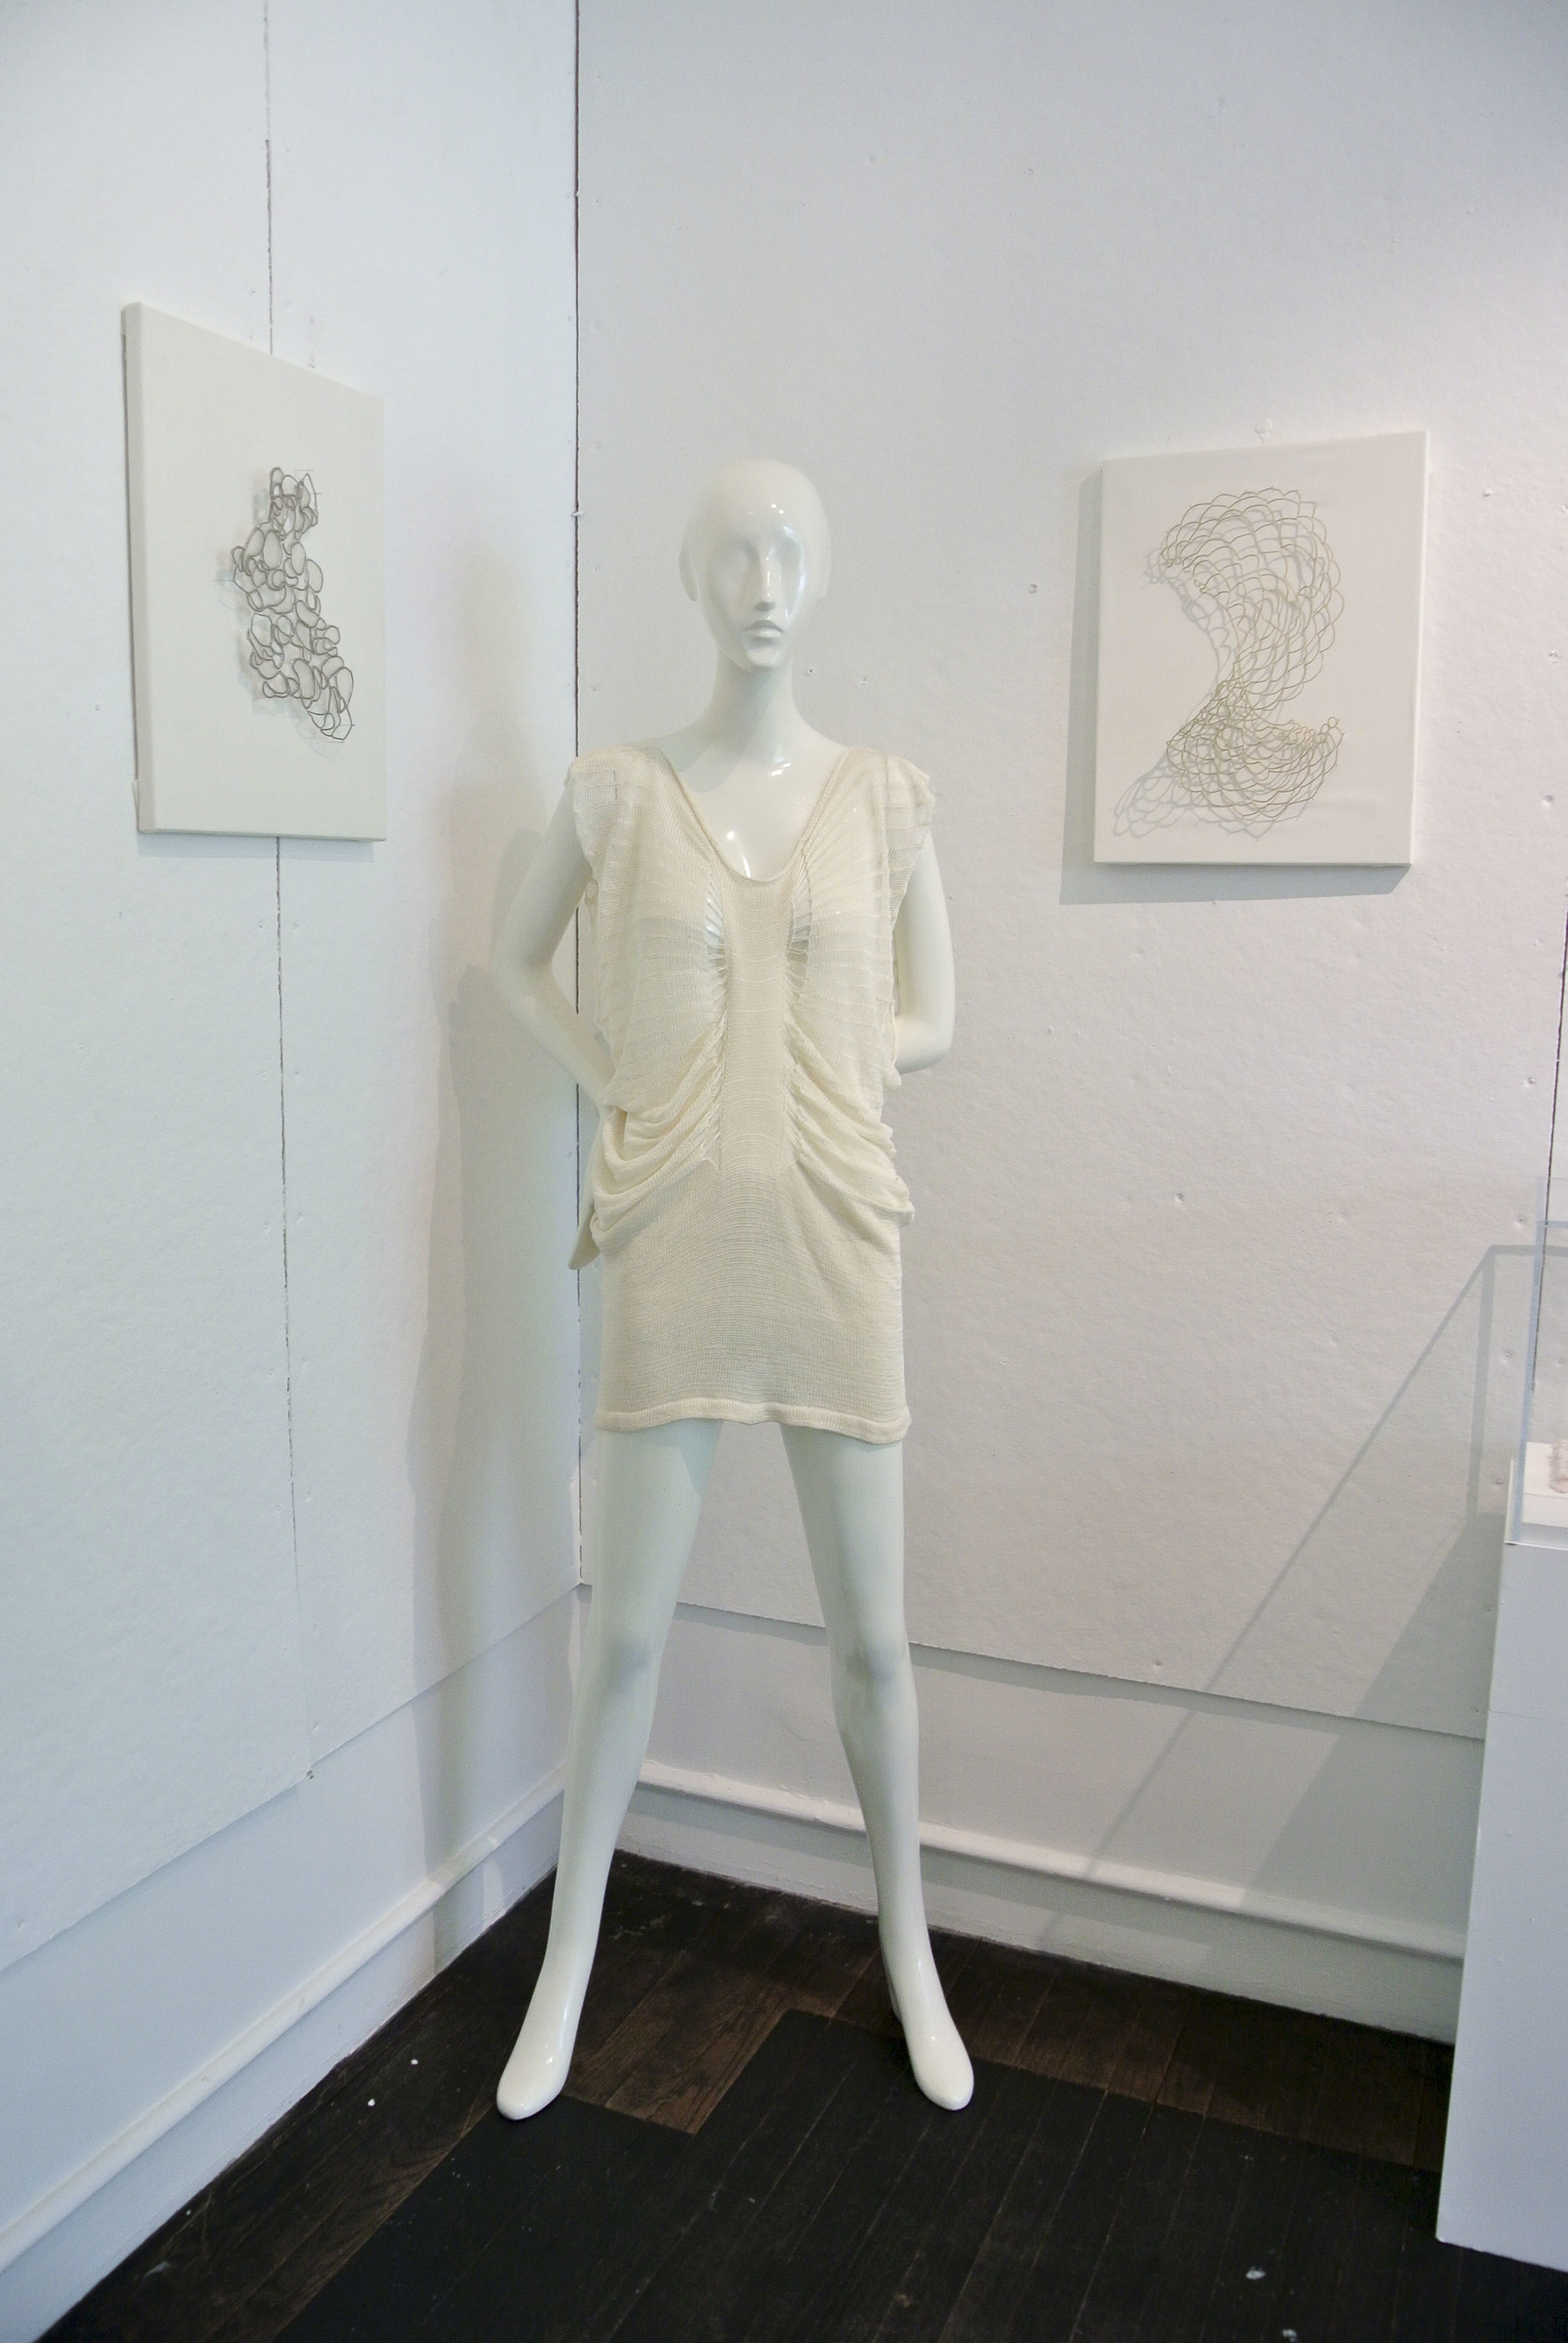 dresses on mannequins_3.JPG